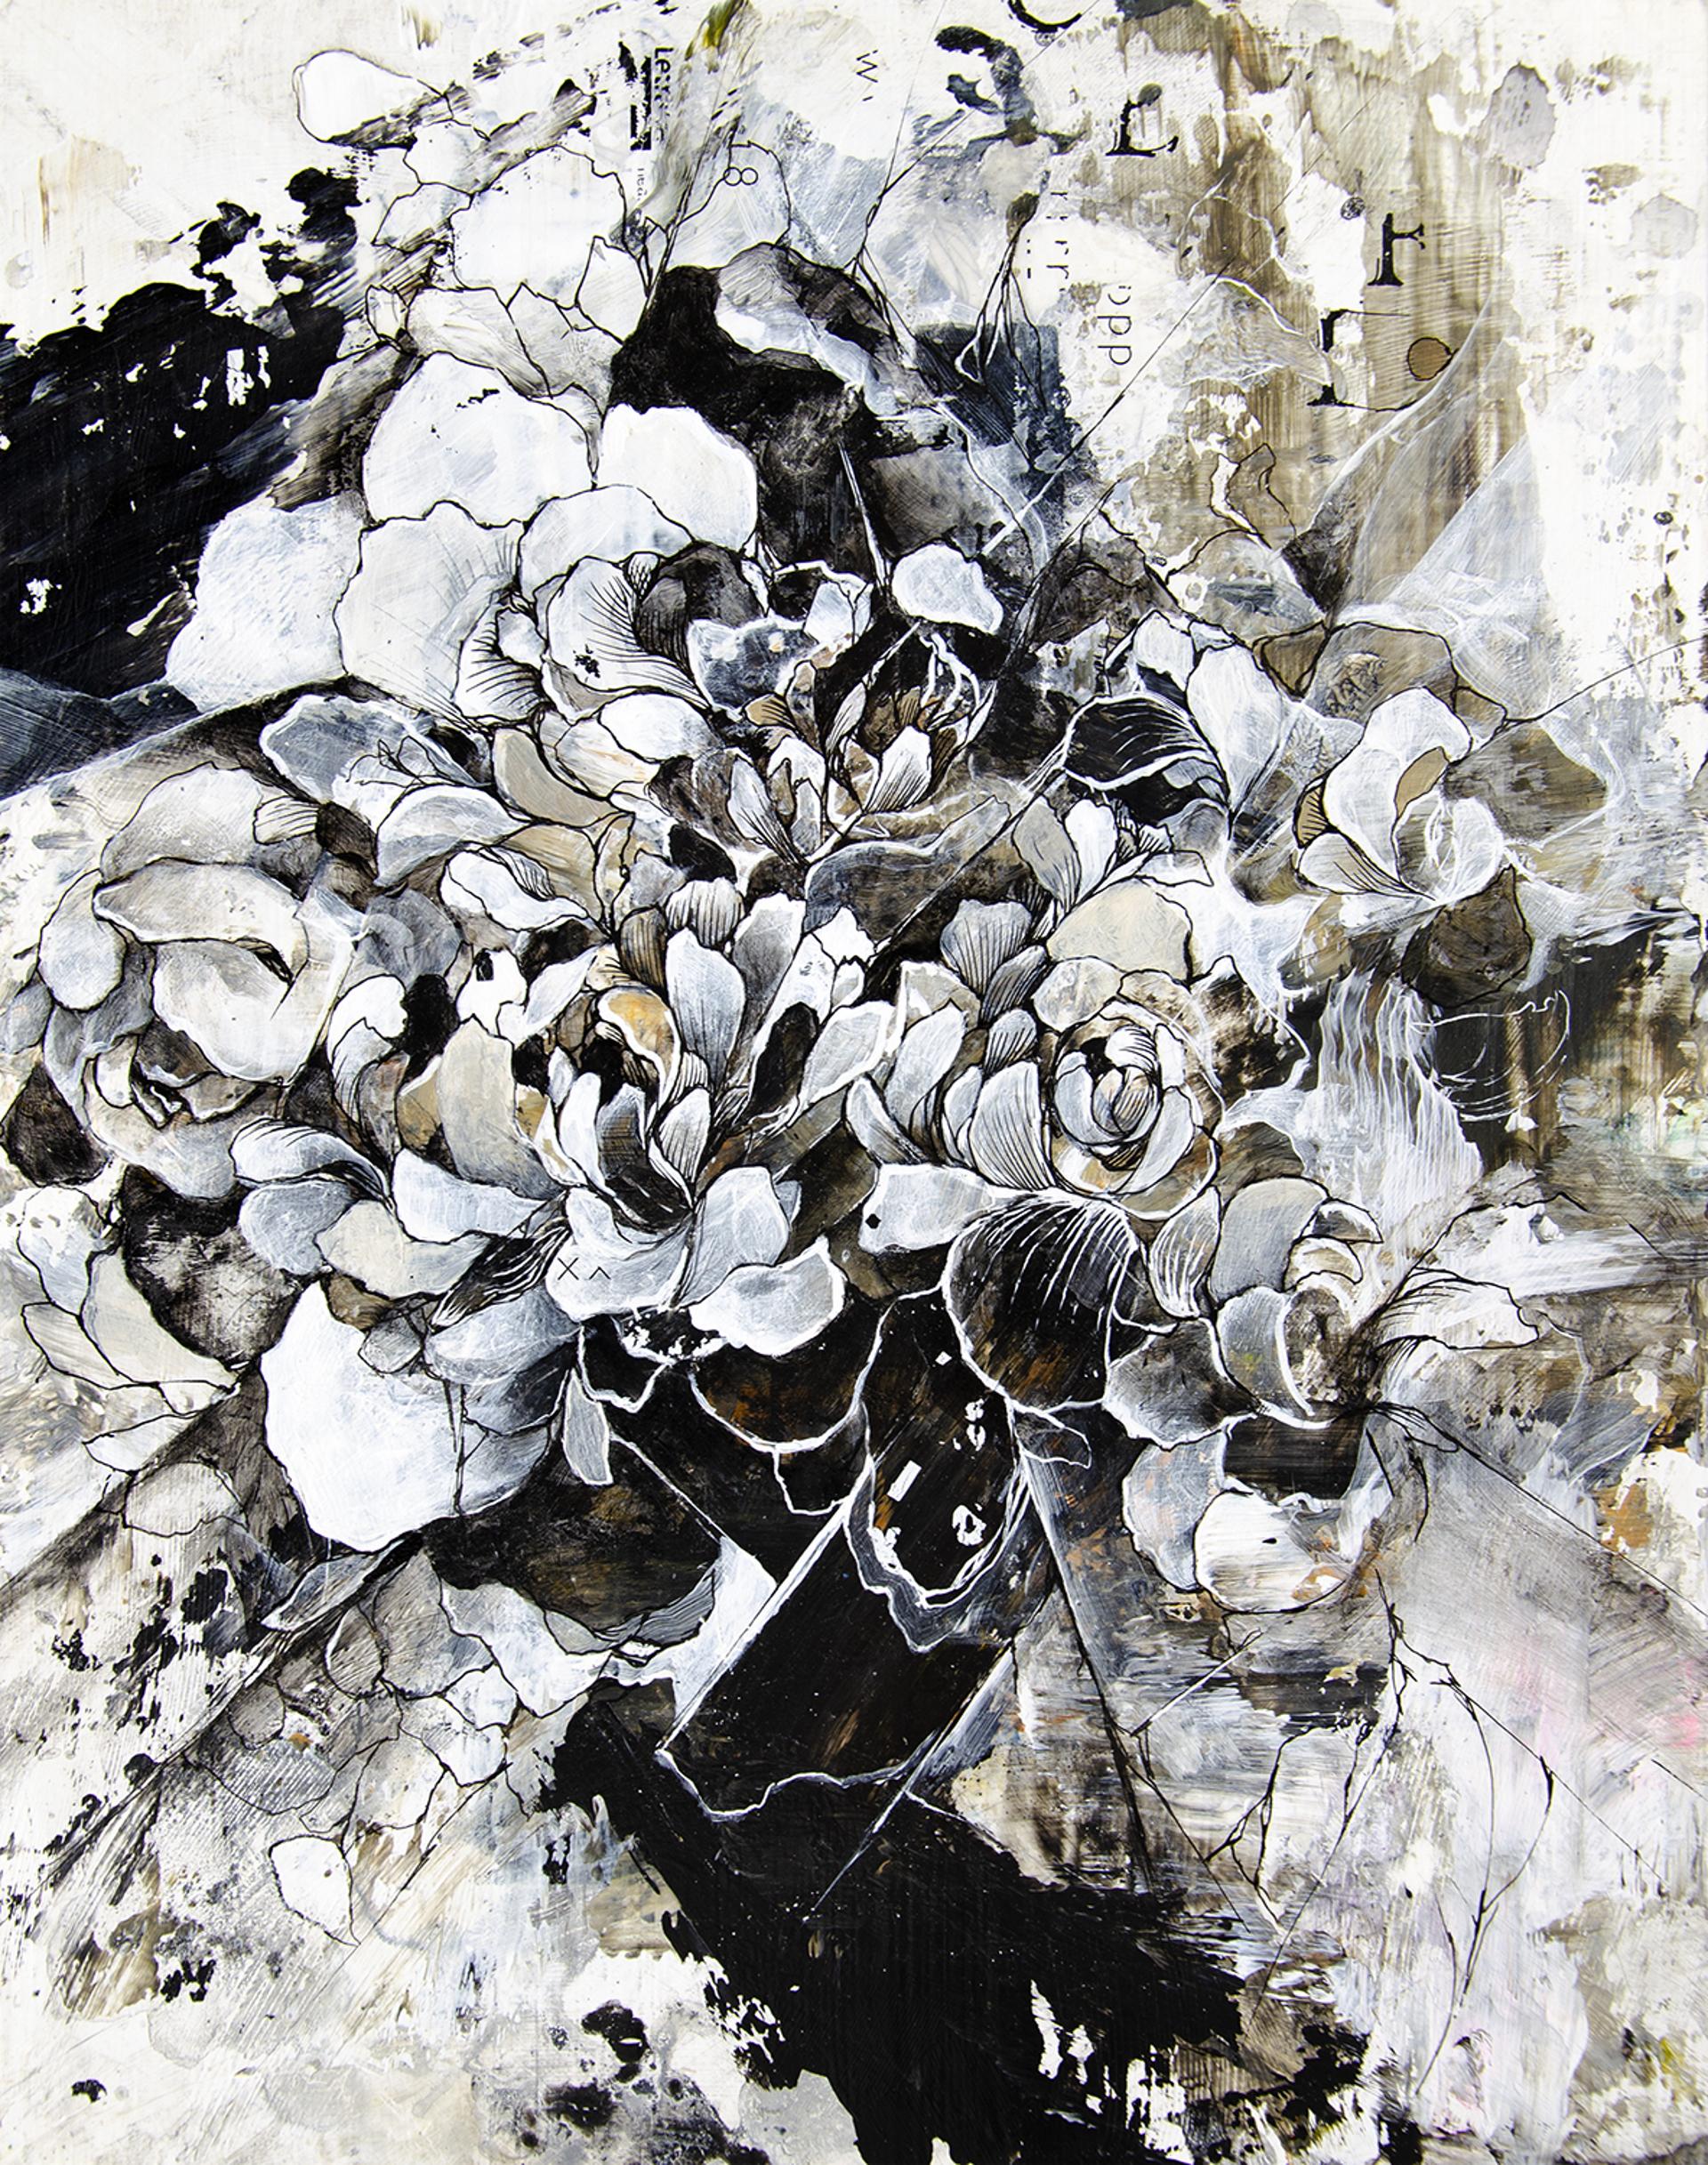 Floral Study I by Aiden Kringen